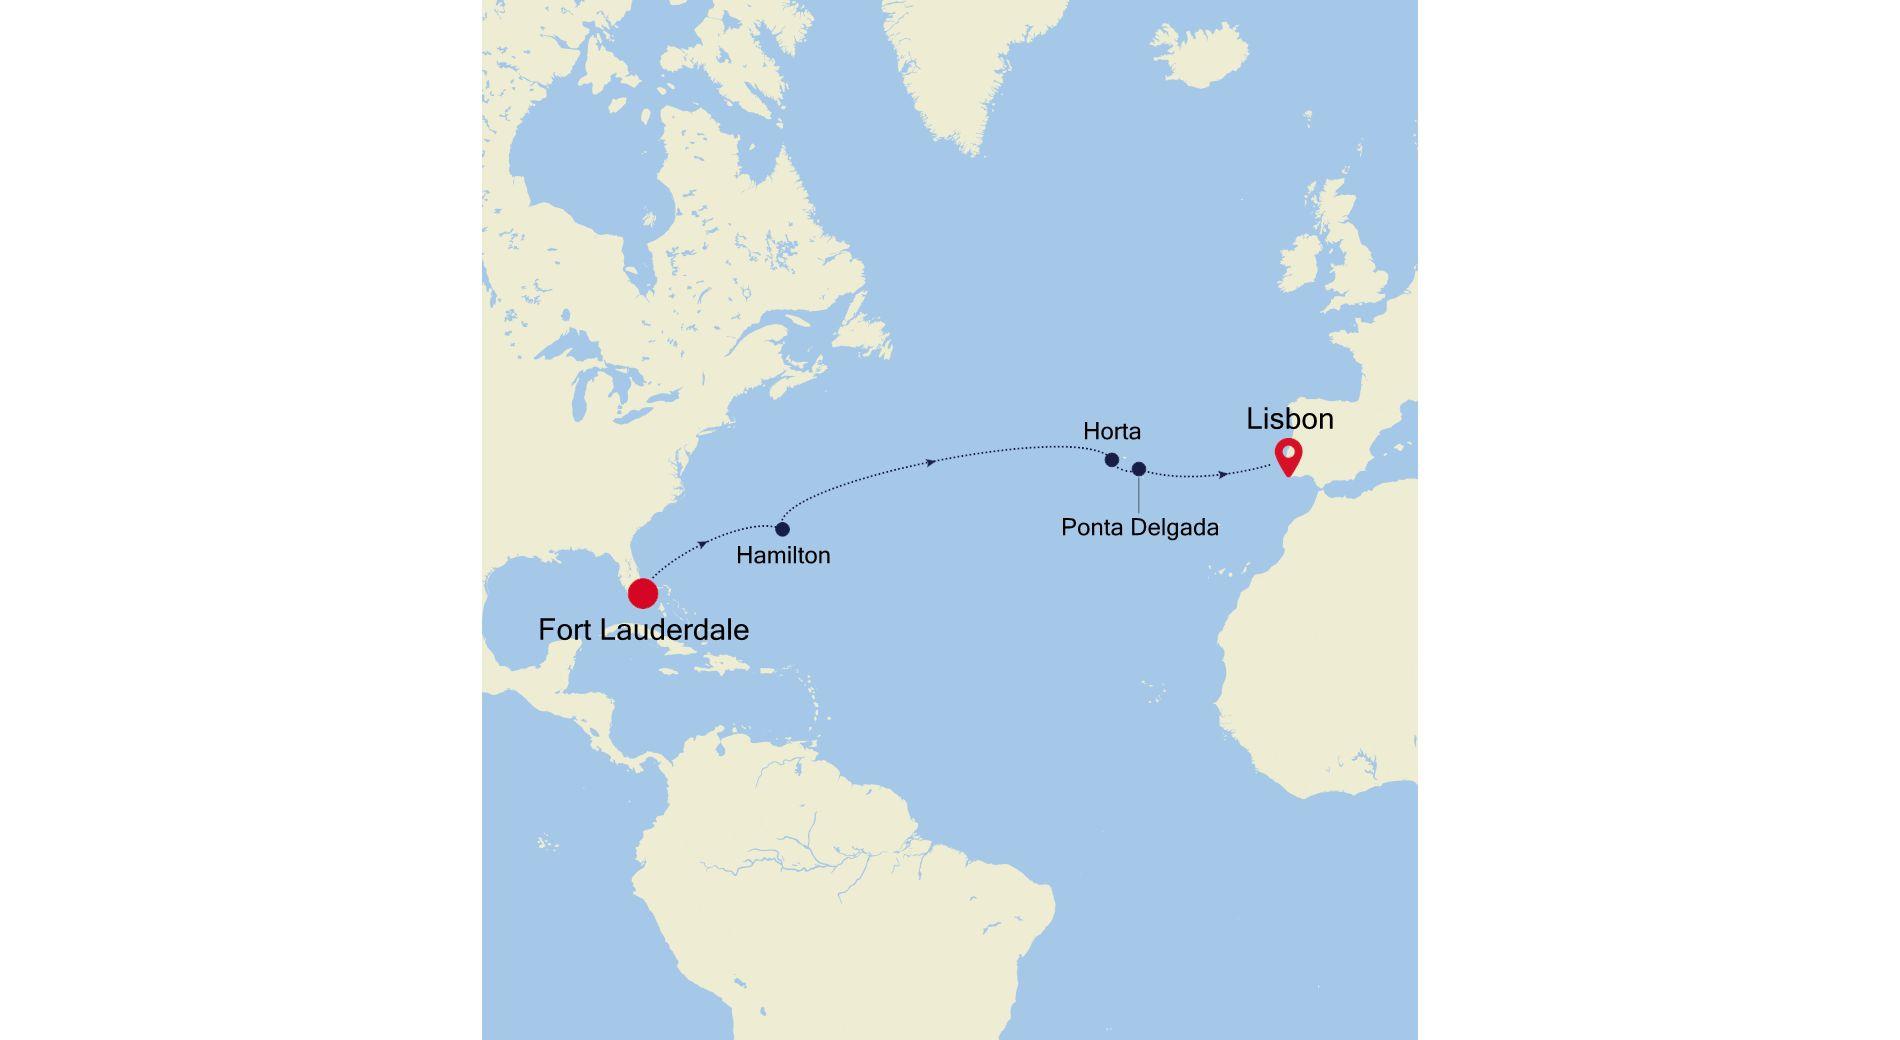 5910 - Fort Lauderdale to Lisbon